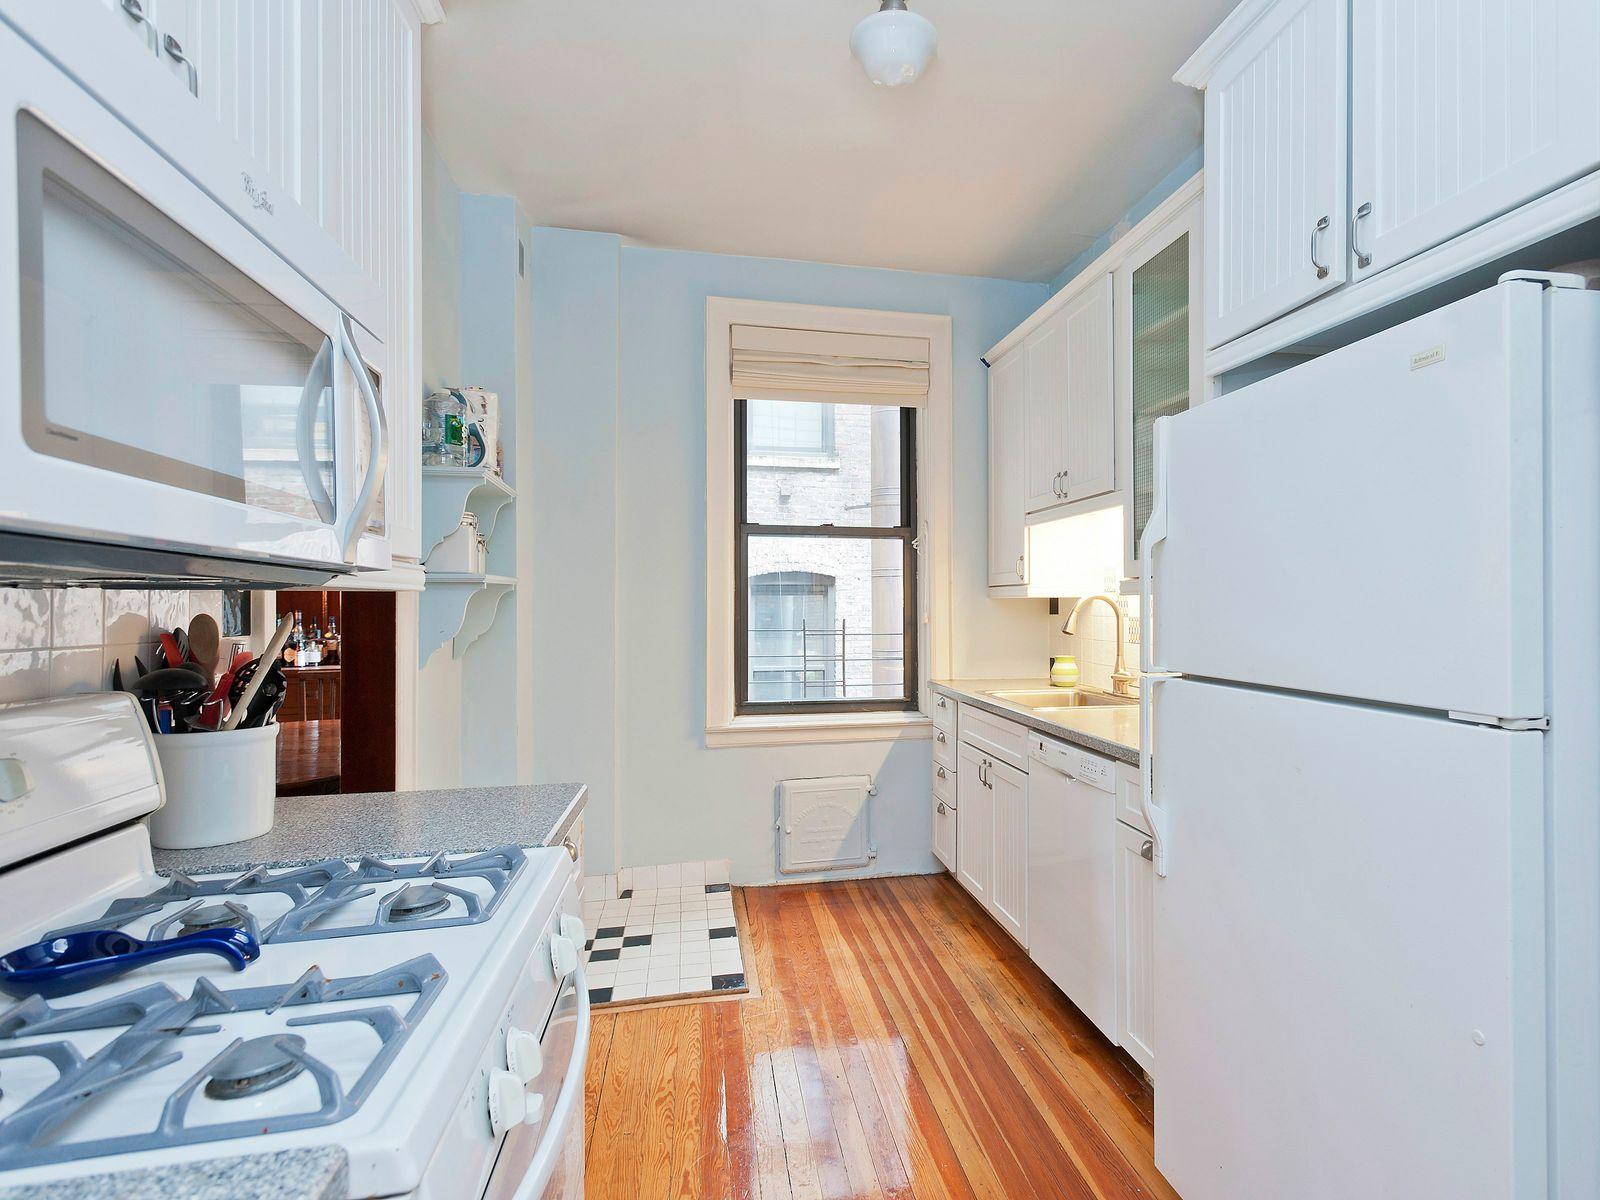 500 West 111th Street